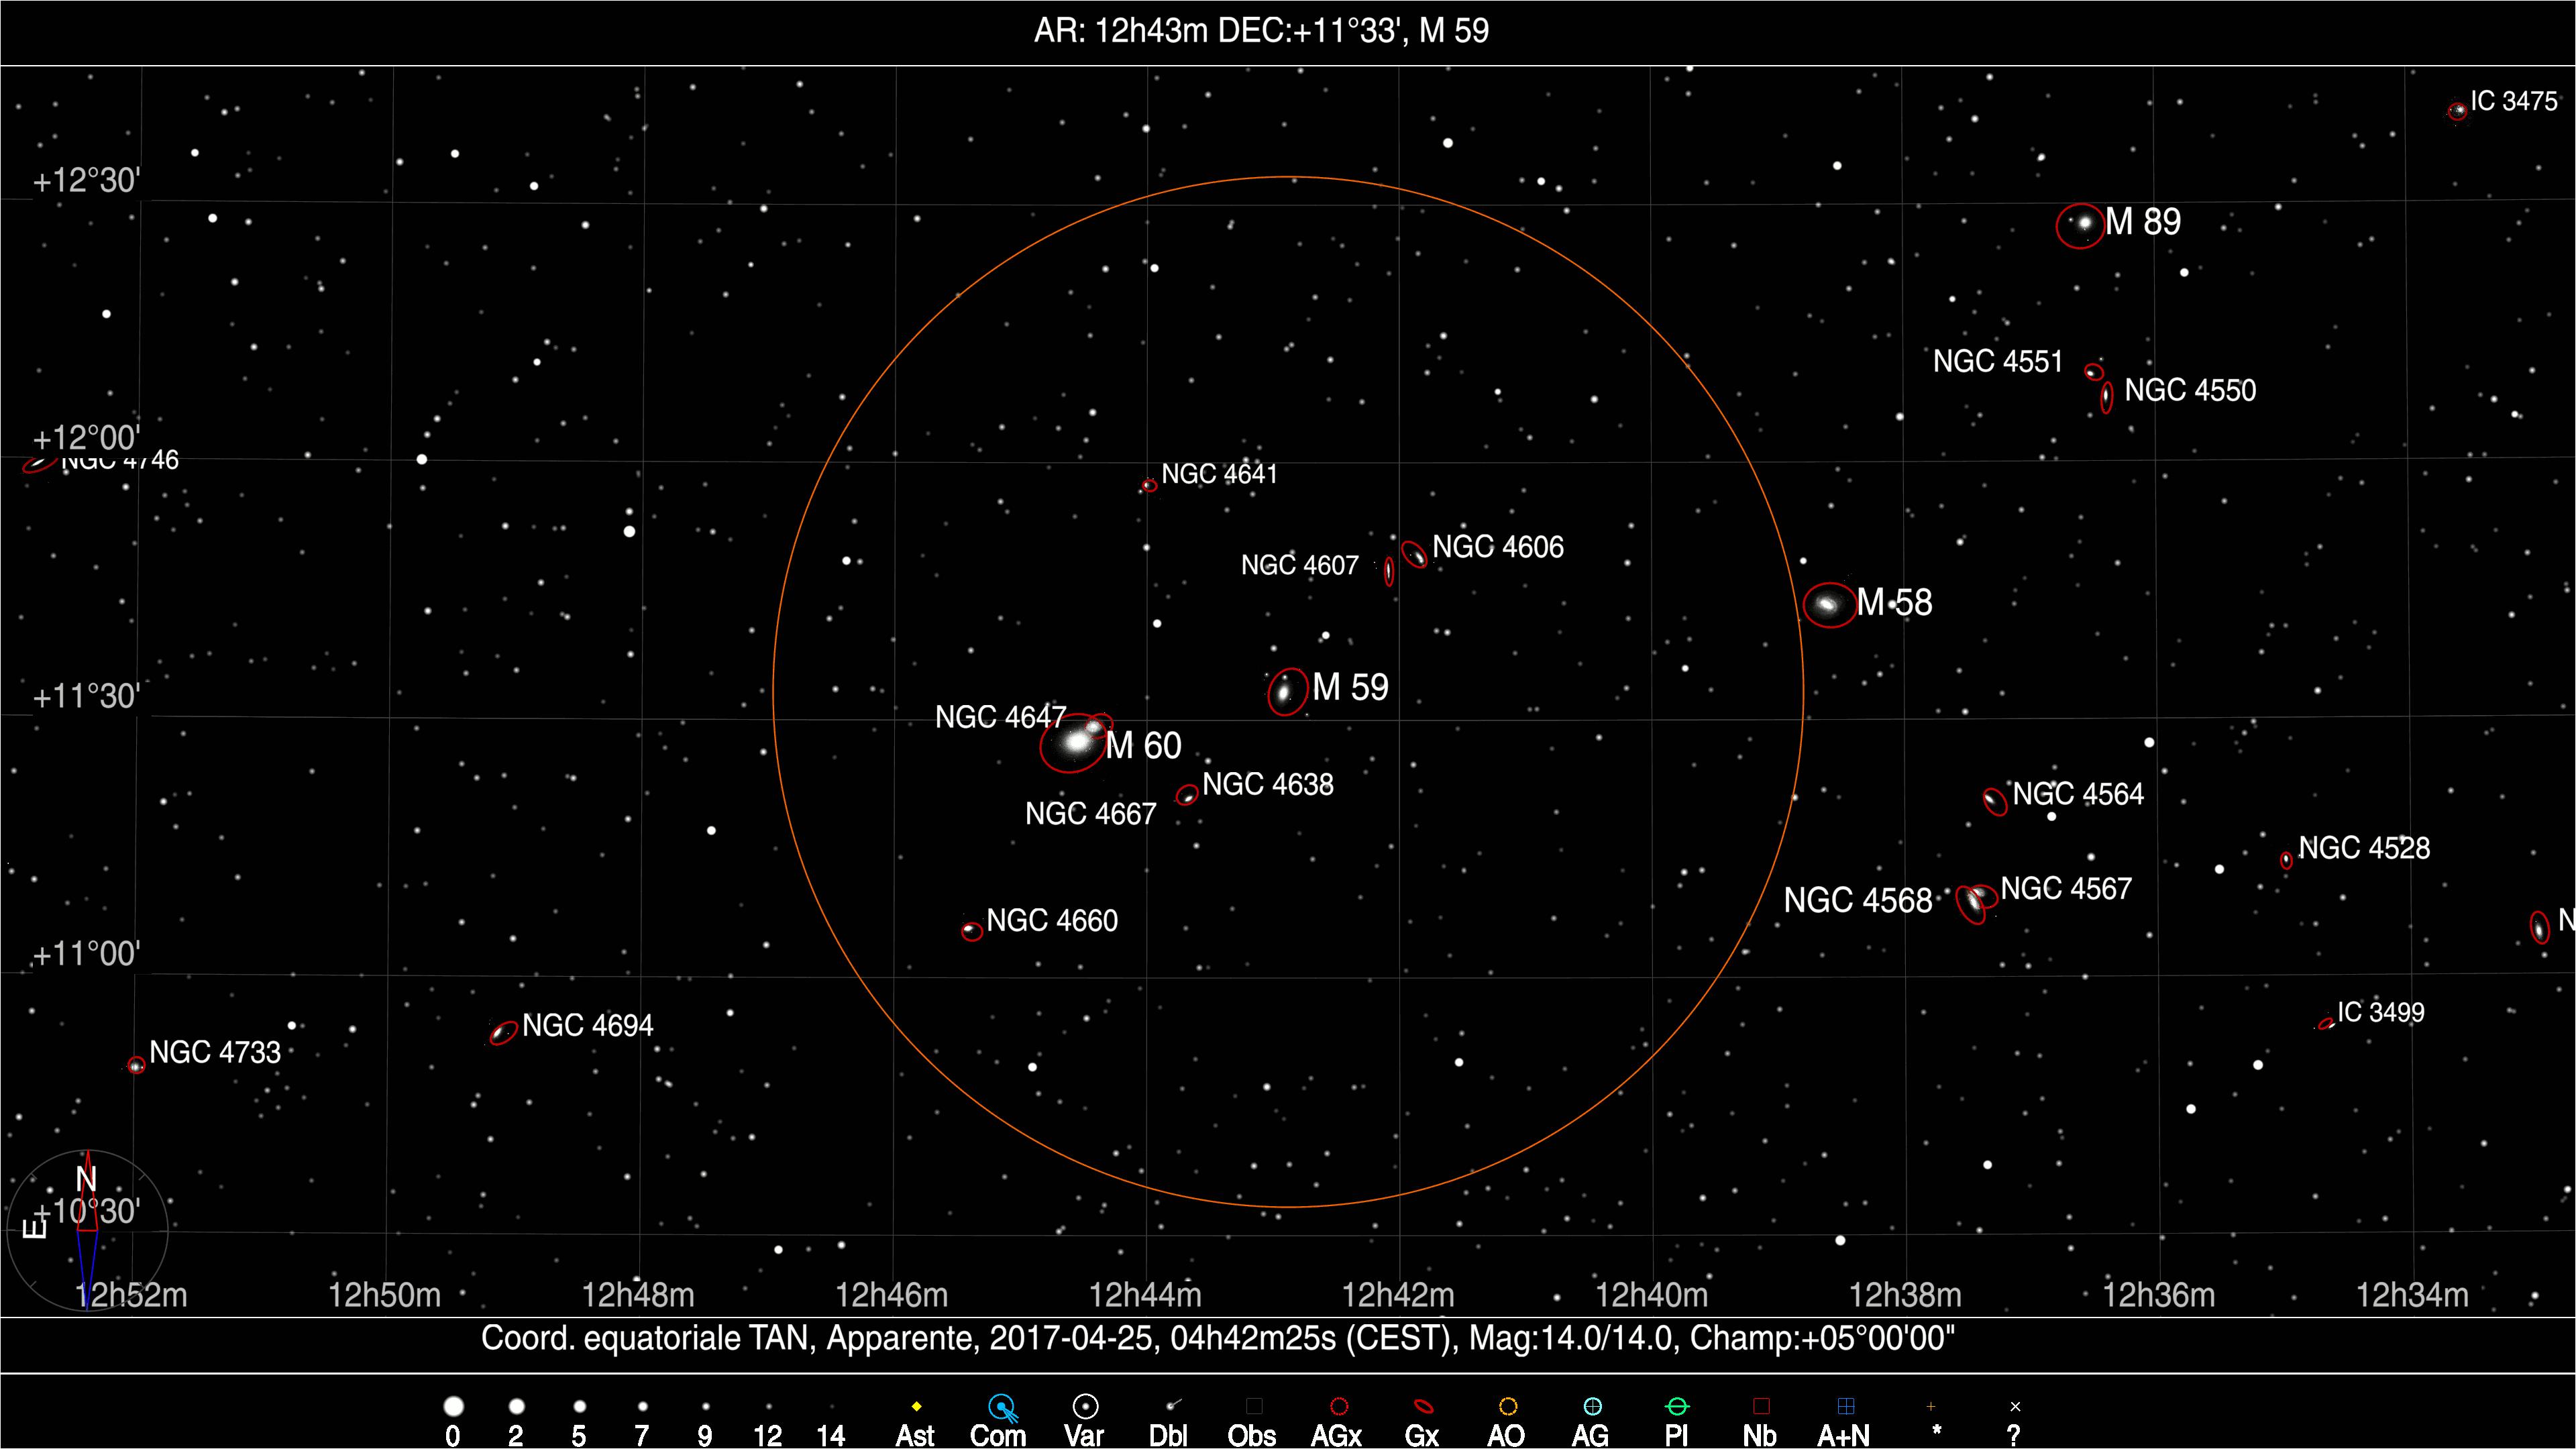 M59_5